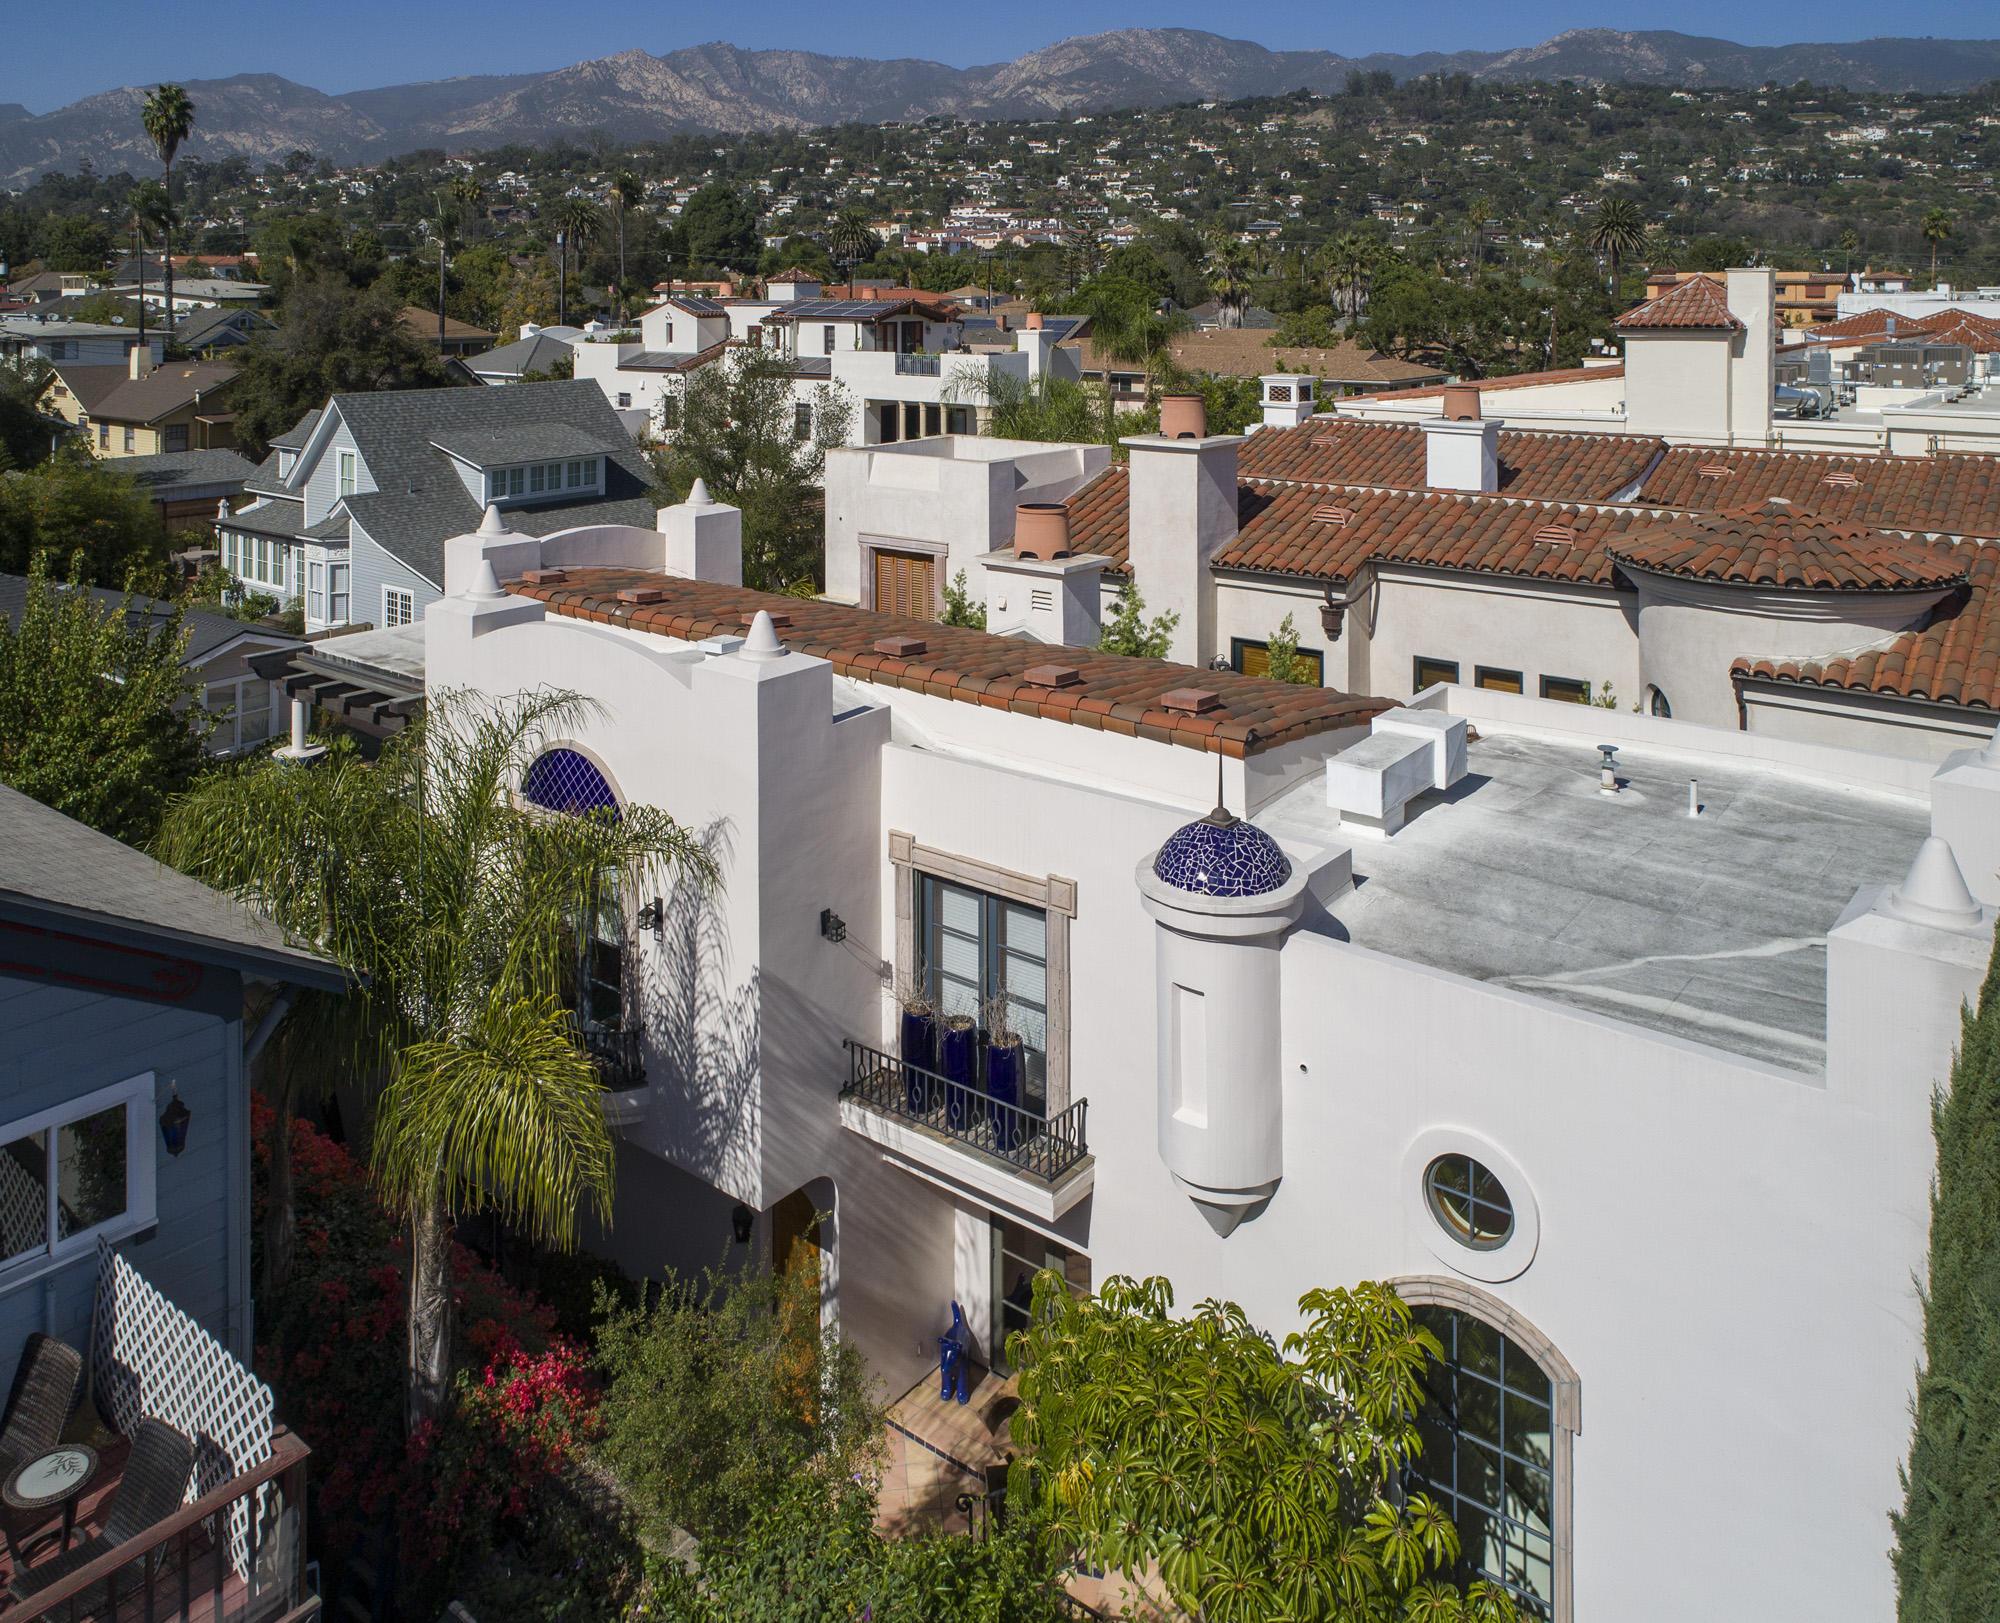 Property photo for 212 Equestrian Ave Santa Barbara, California 93101 - 17-3526